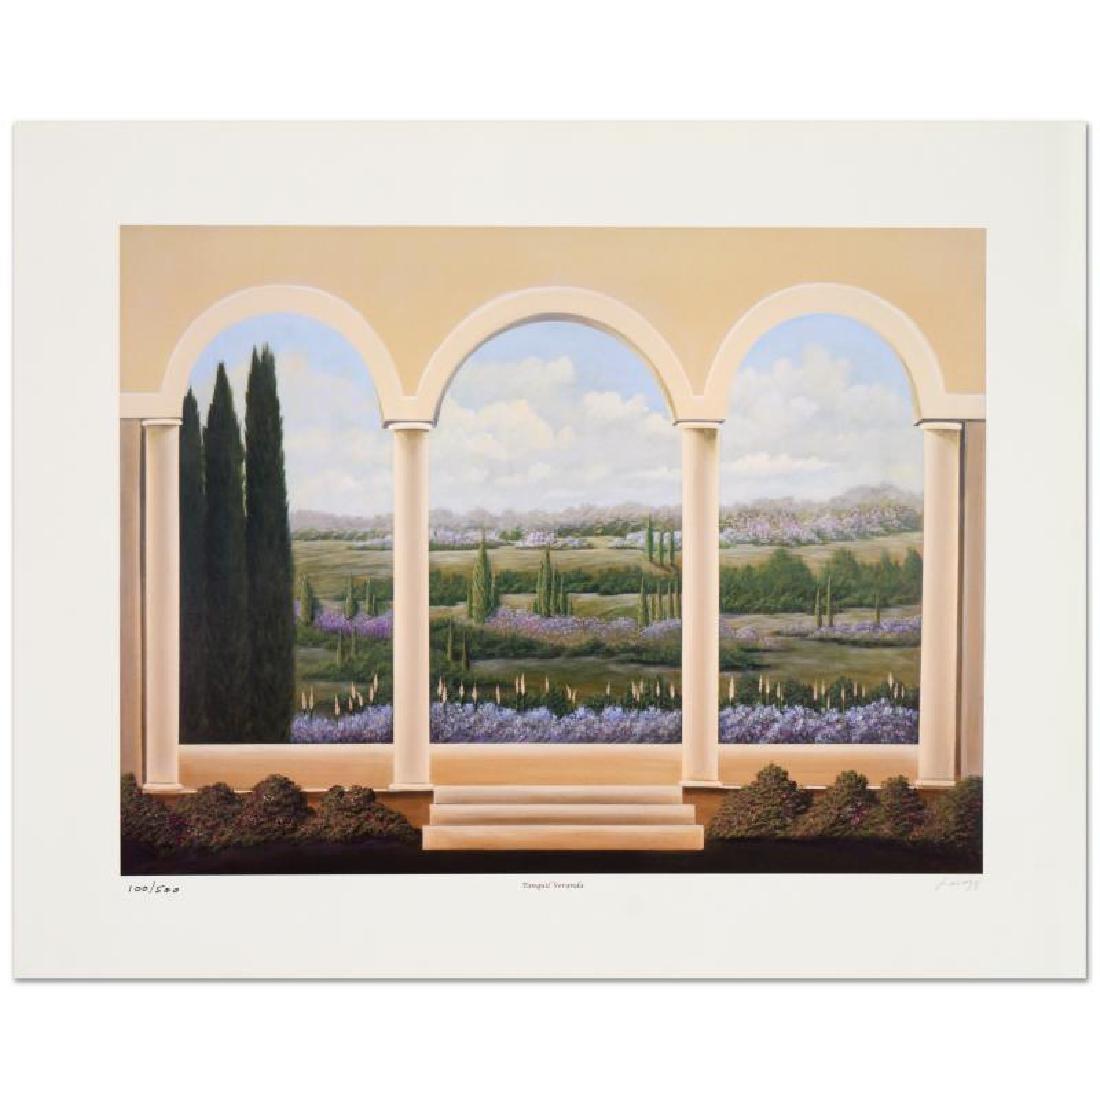 "Steven Lavaggi - ""Tranquil Veranda"" Limited Edition"